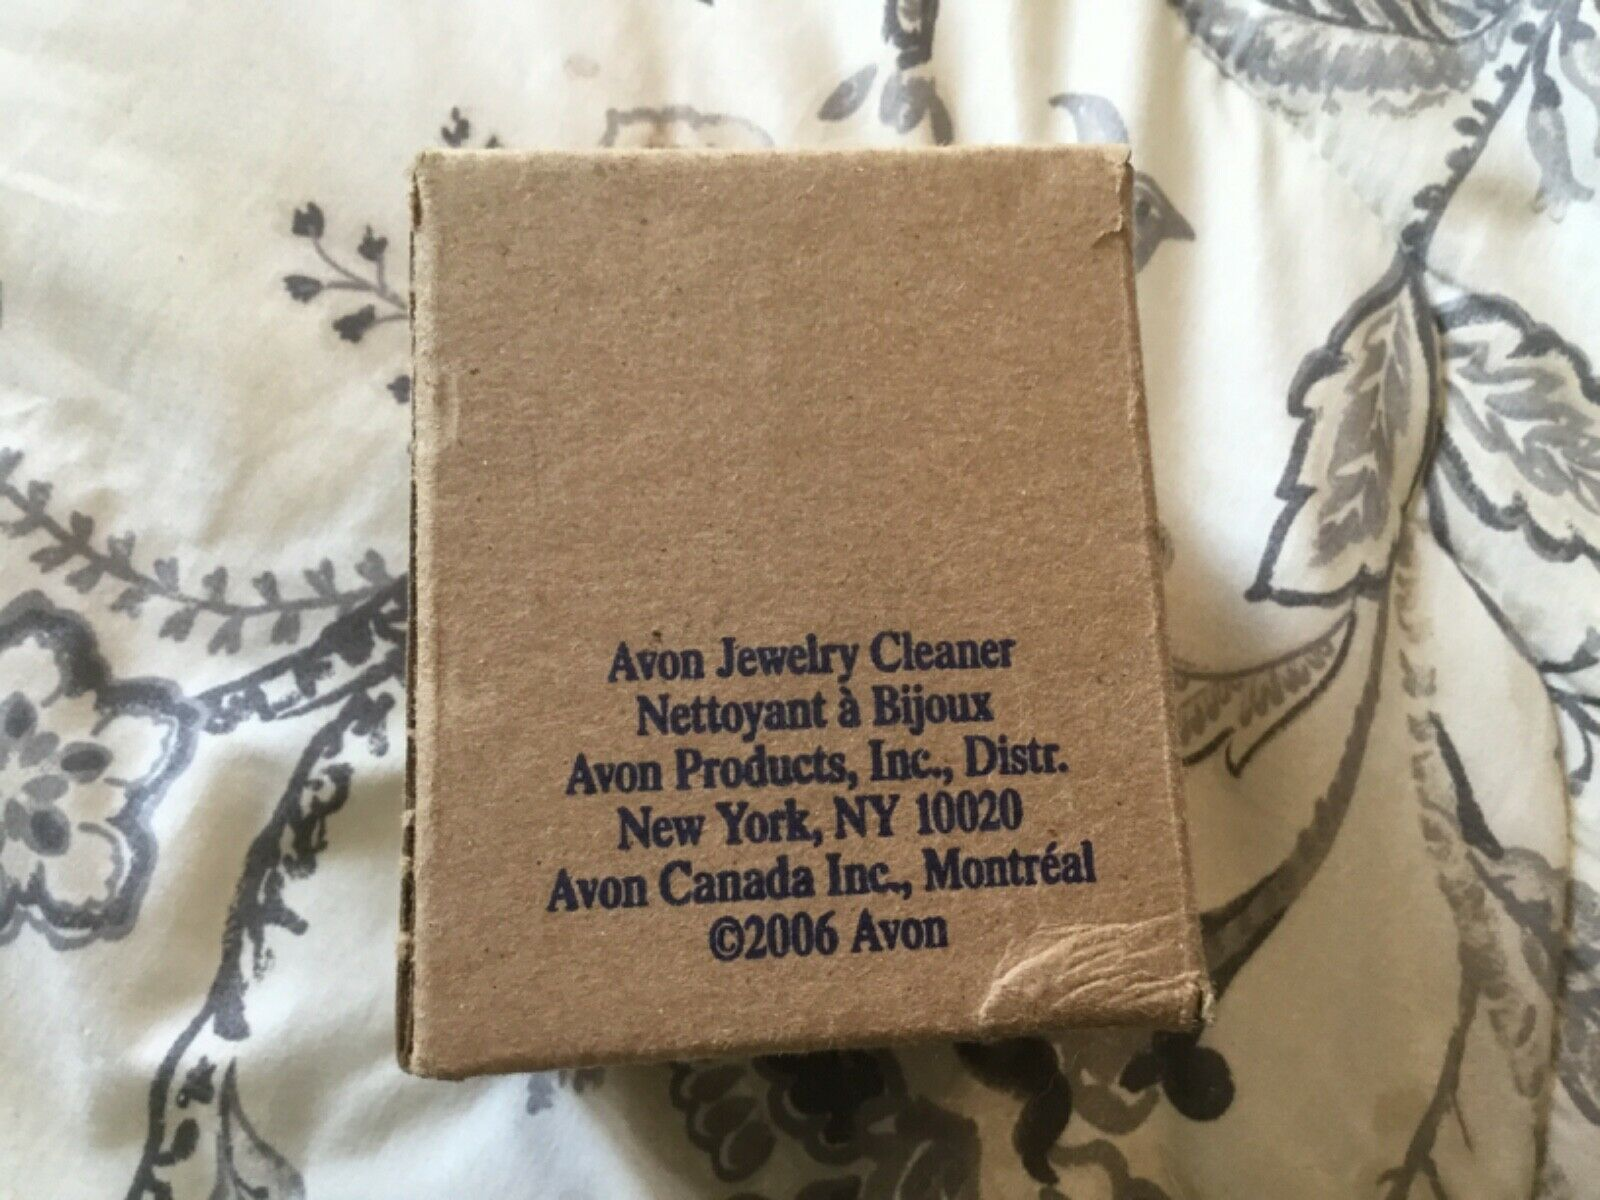 Avon Jewelry Cleaner